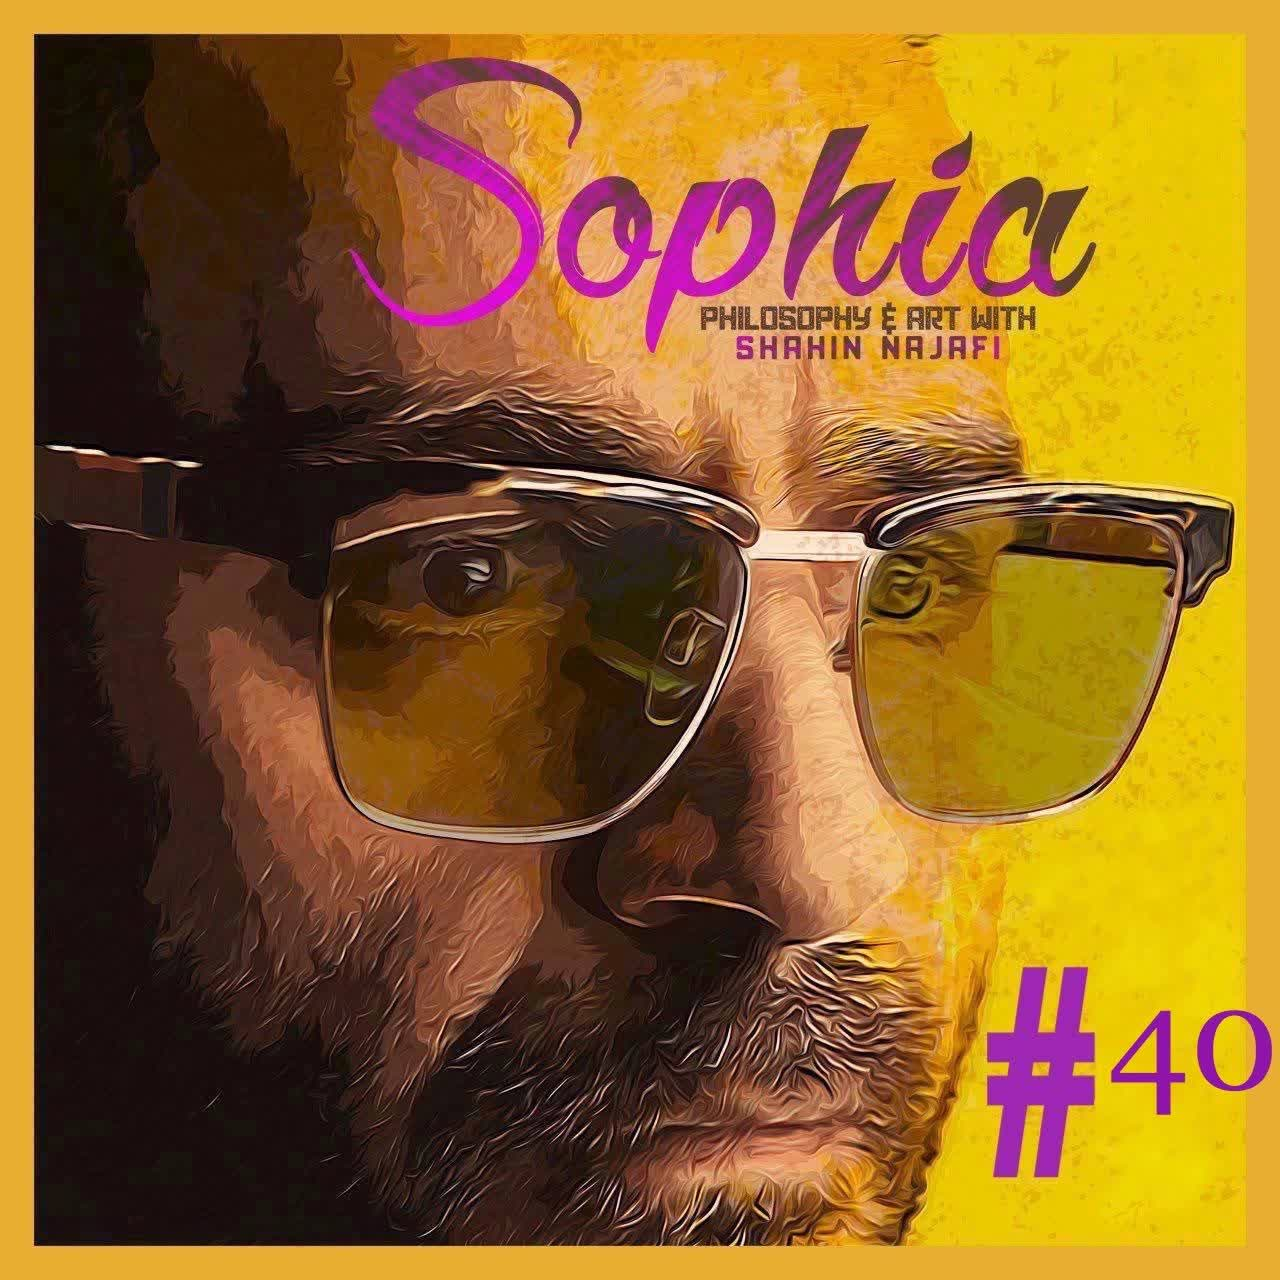 Sophia #40 - Epicurus - Shahin Najafi & Veria Amiri سوفیا ۴۰- اپیکور- شاهین نجفی و وریا امیری